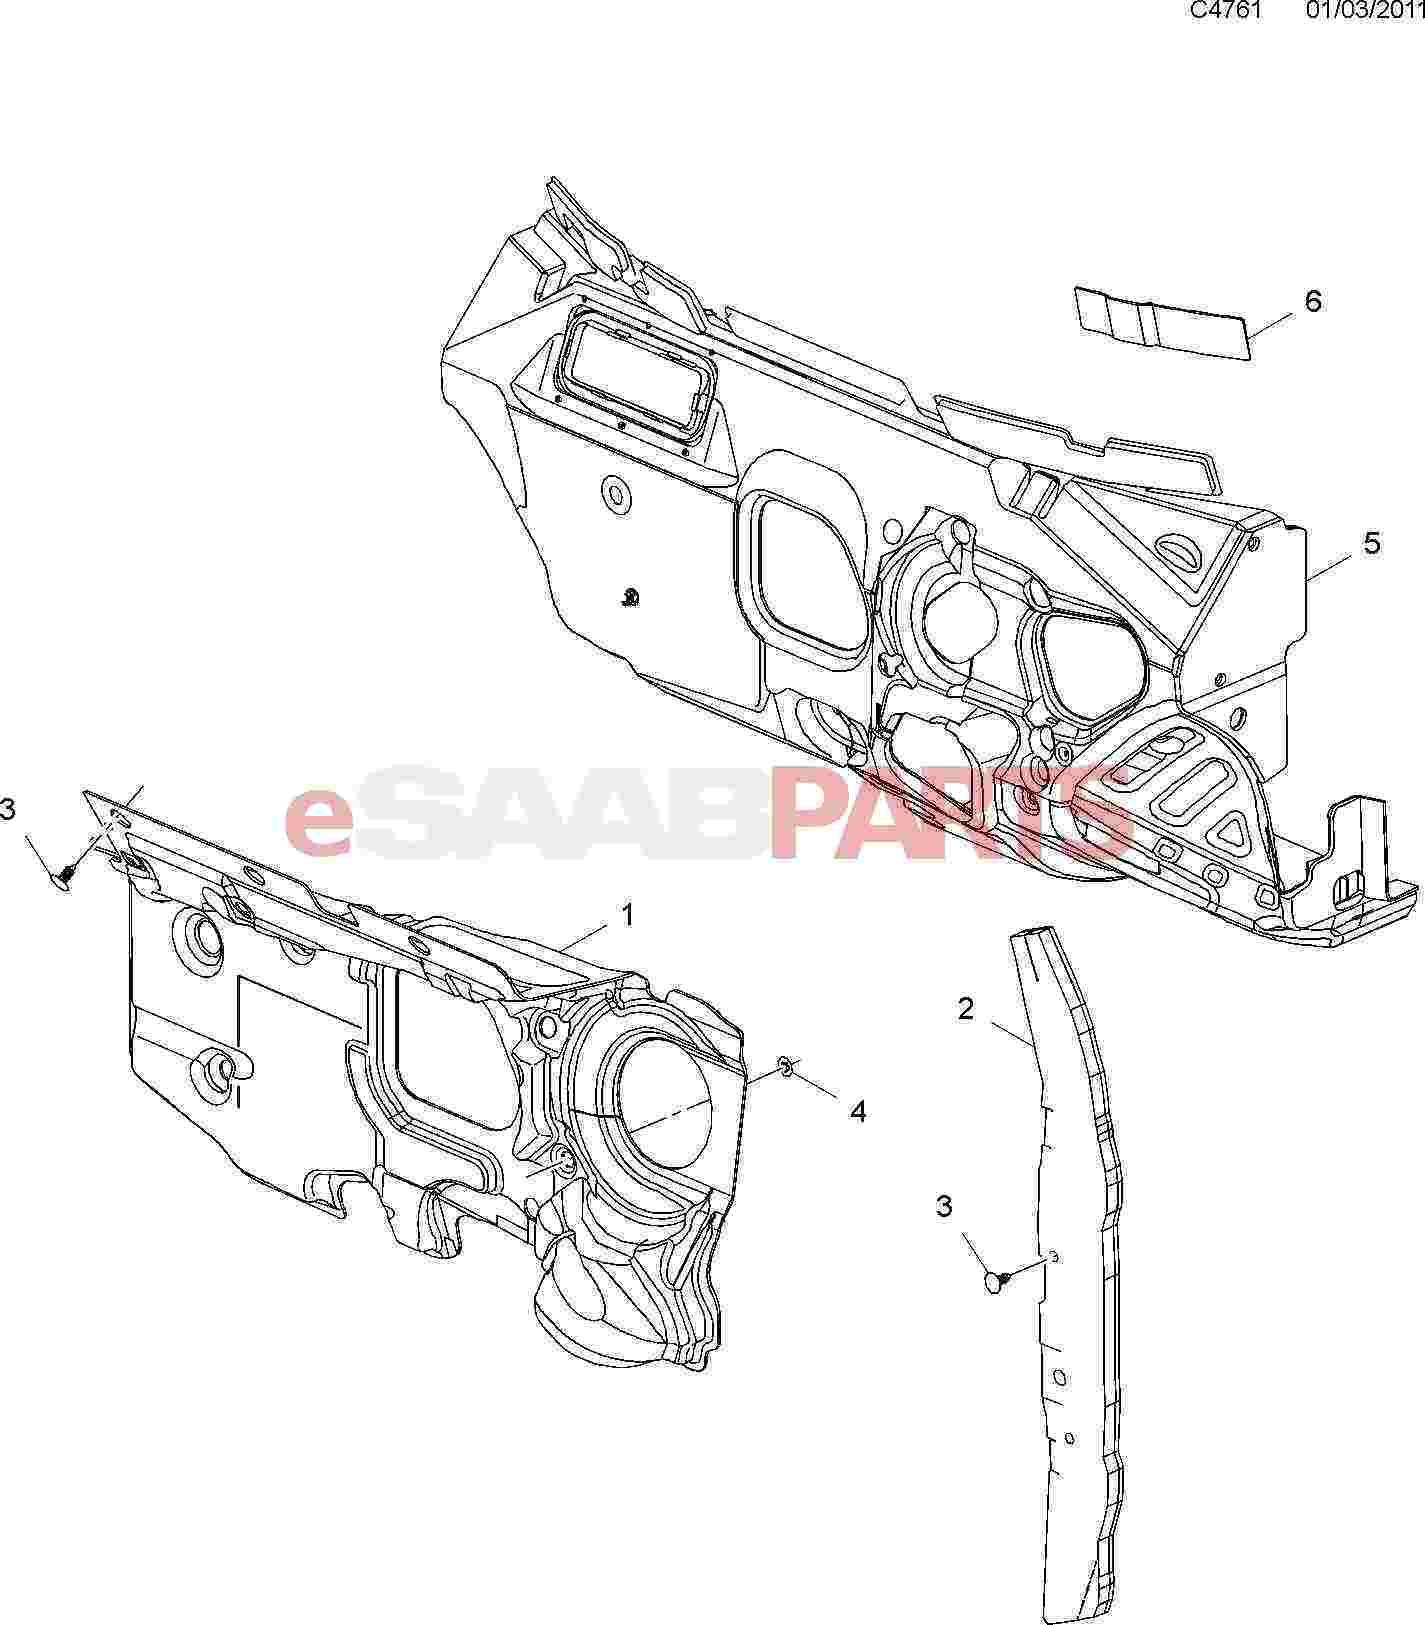 diagram moreover 2000 mitsubishi galant engine diagram besides